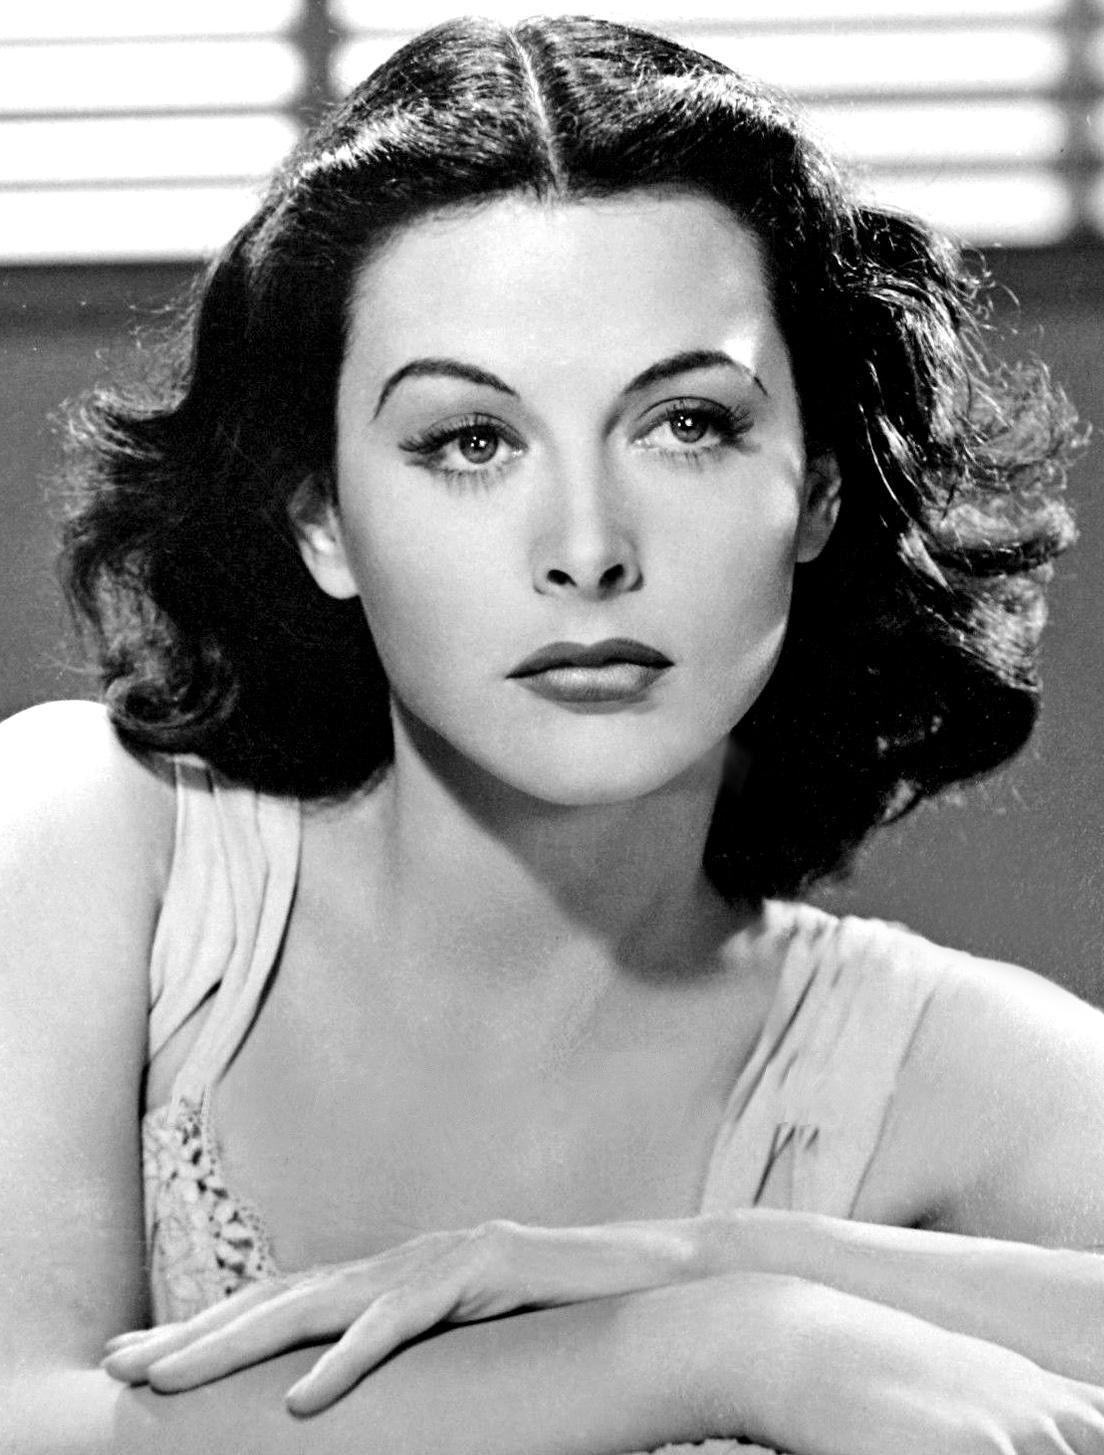 Hedy Lamarr in 1940: Credit: Dogwoof